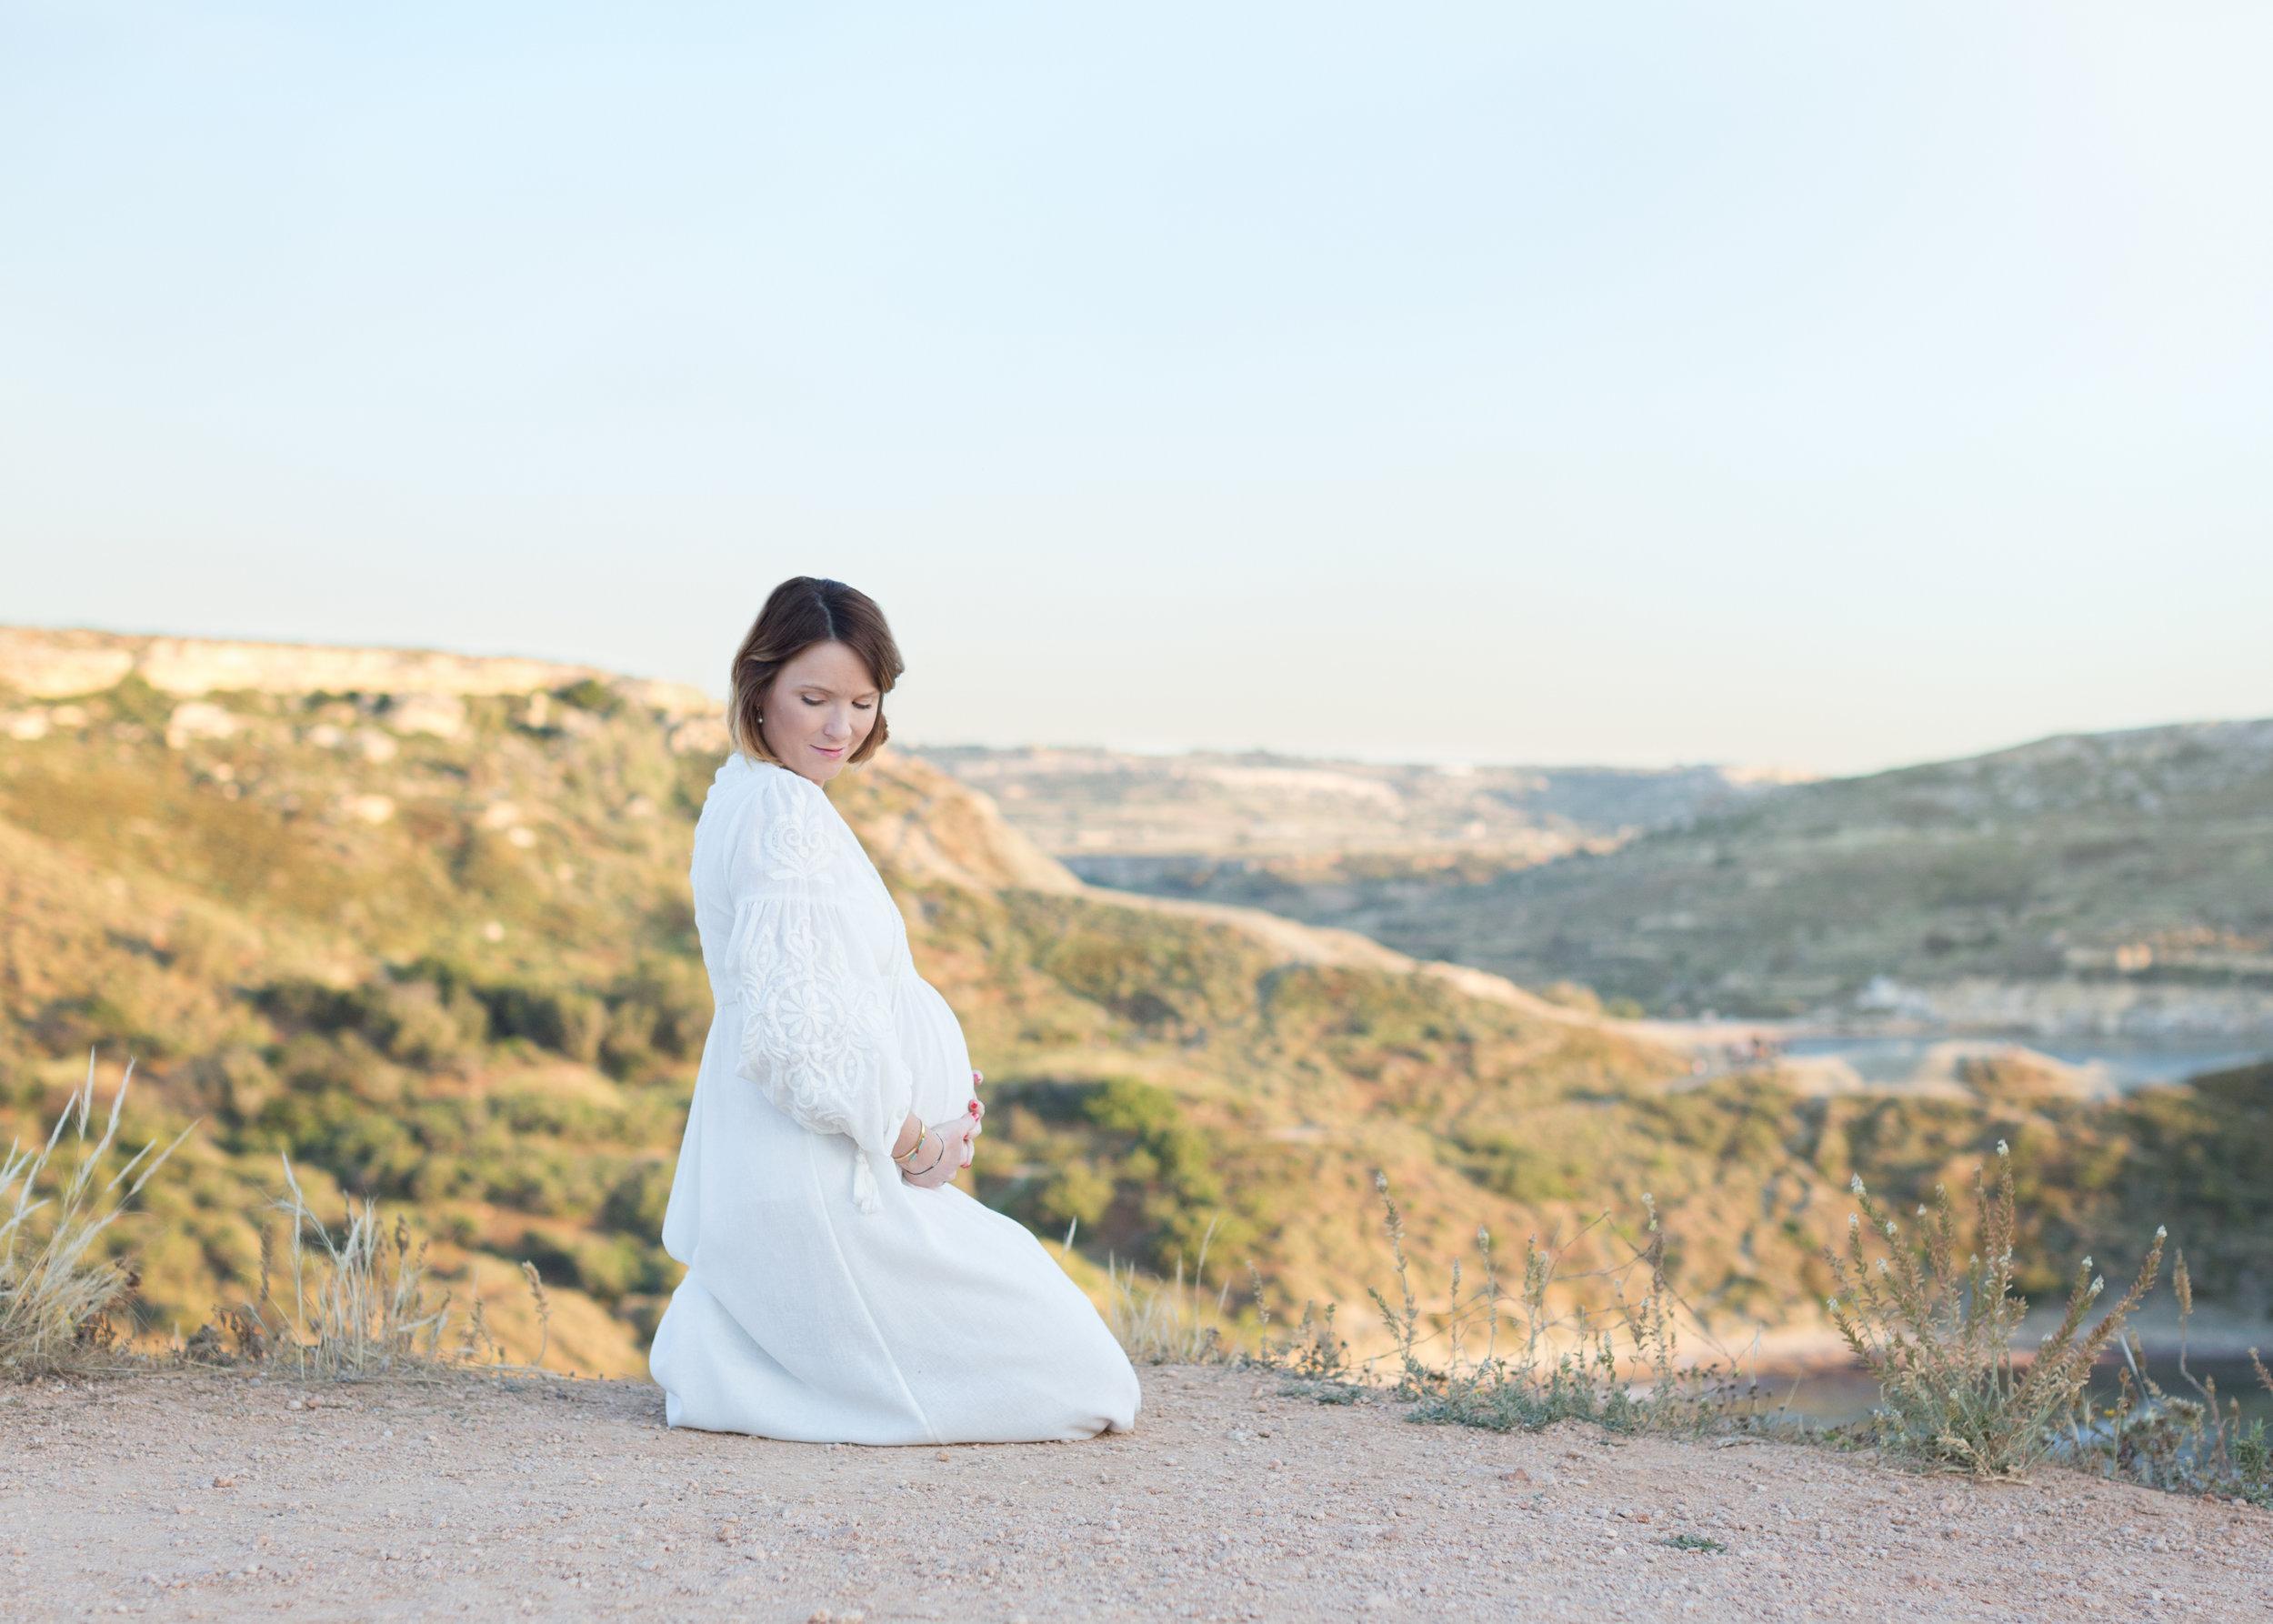 maternity photographer malta, sunset, backlight session, maternity photoshoot malta, bohemian photo shoot, glowing mother to be